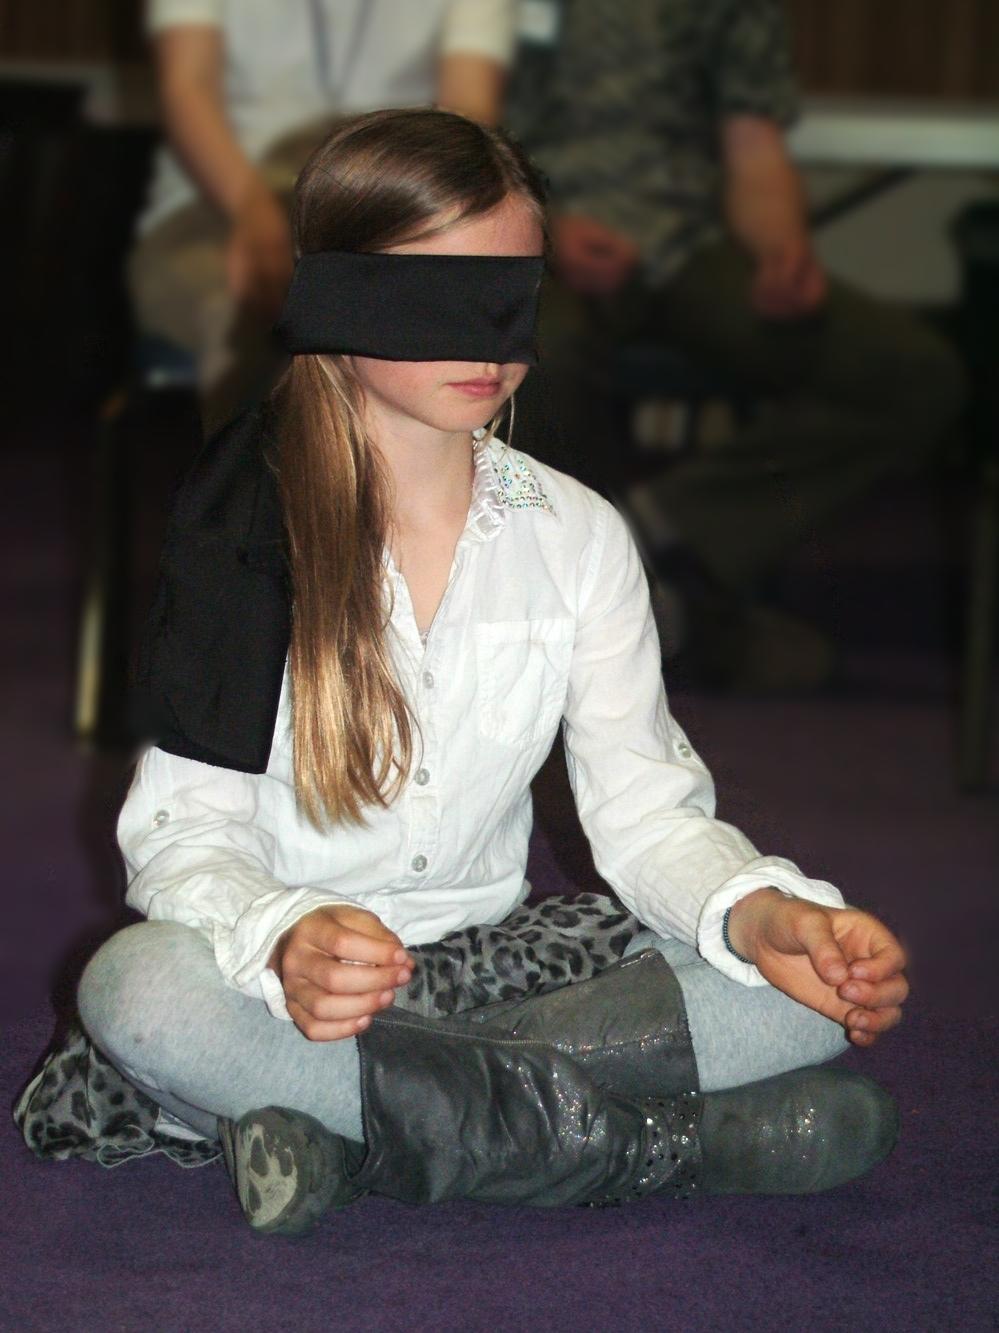 A child in quiet contemplation